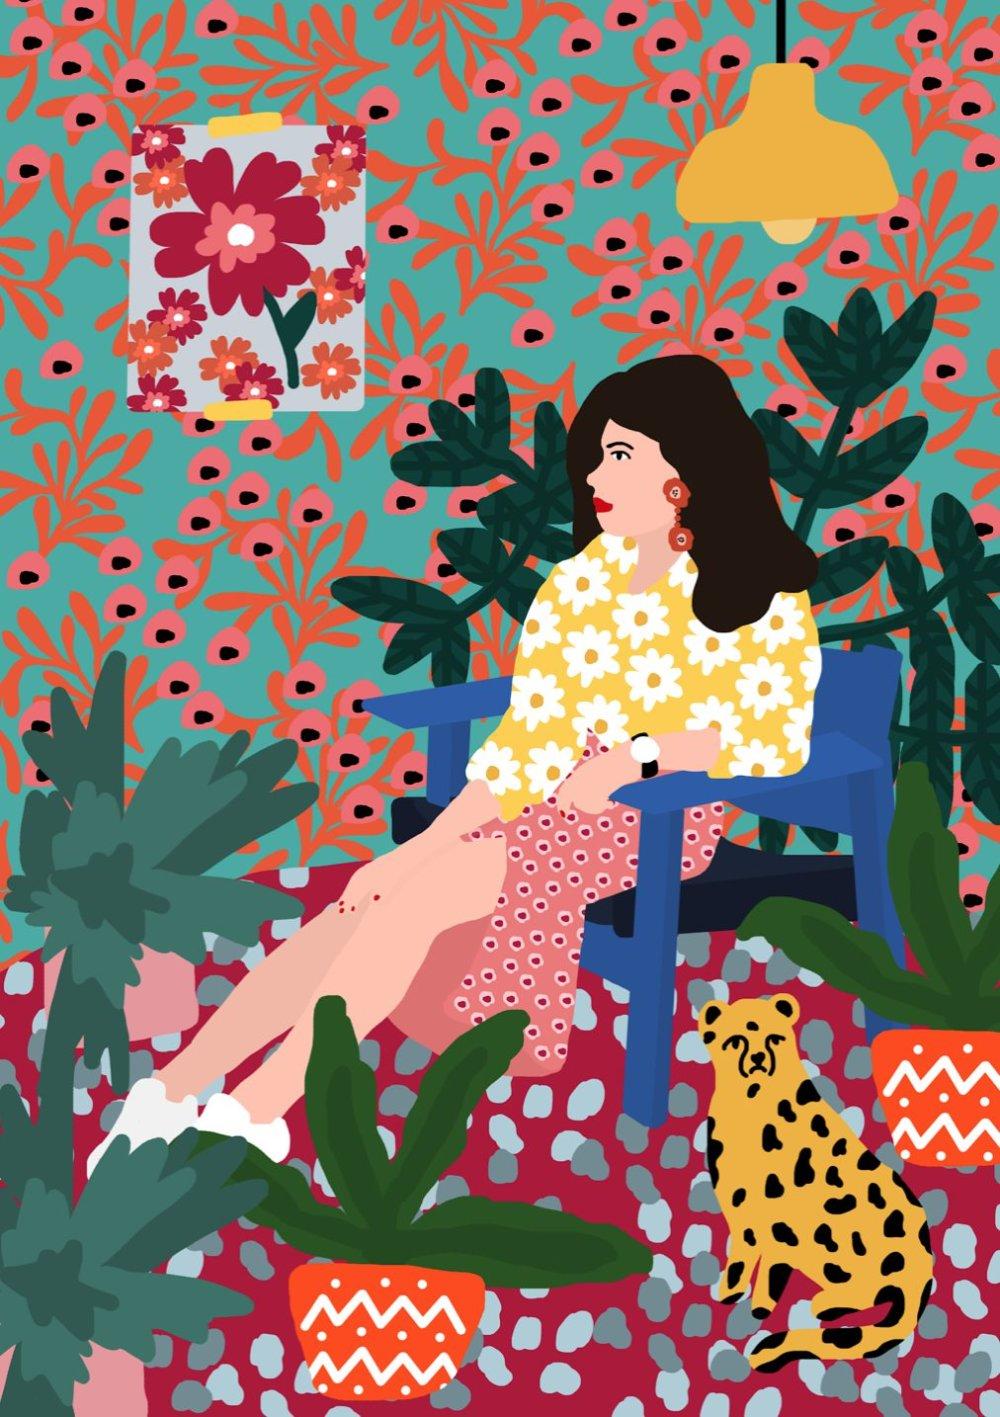 Gorgeous And Colorful Floral Illustrations By Rafaela Mascaro 8